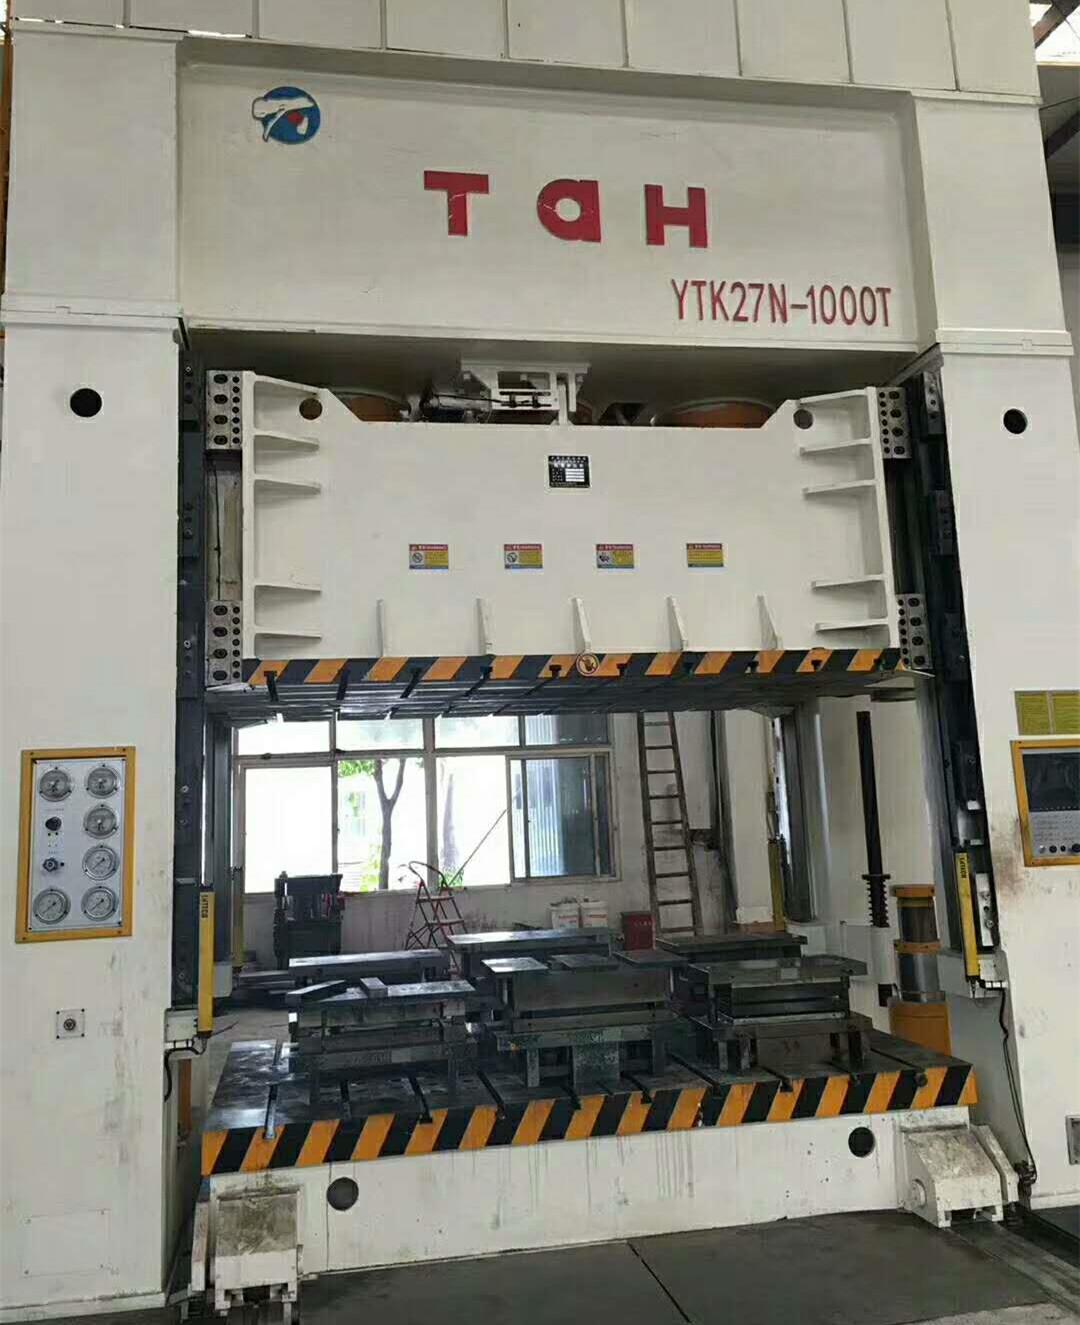 伺服液压机YTK27N-1000T